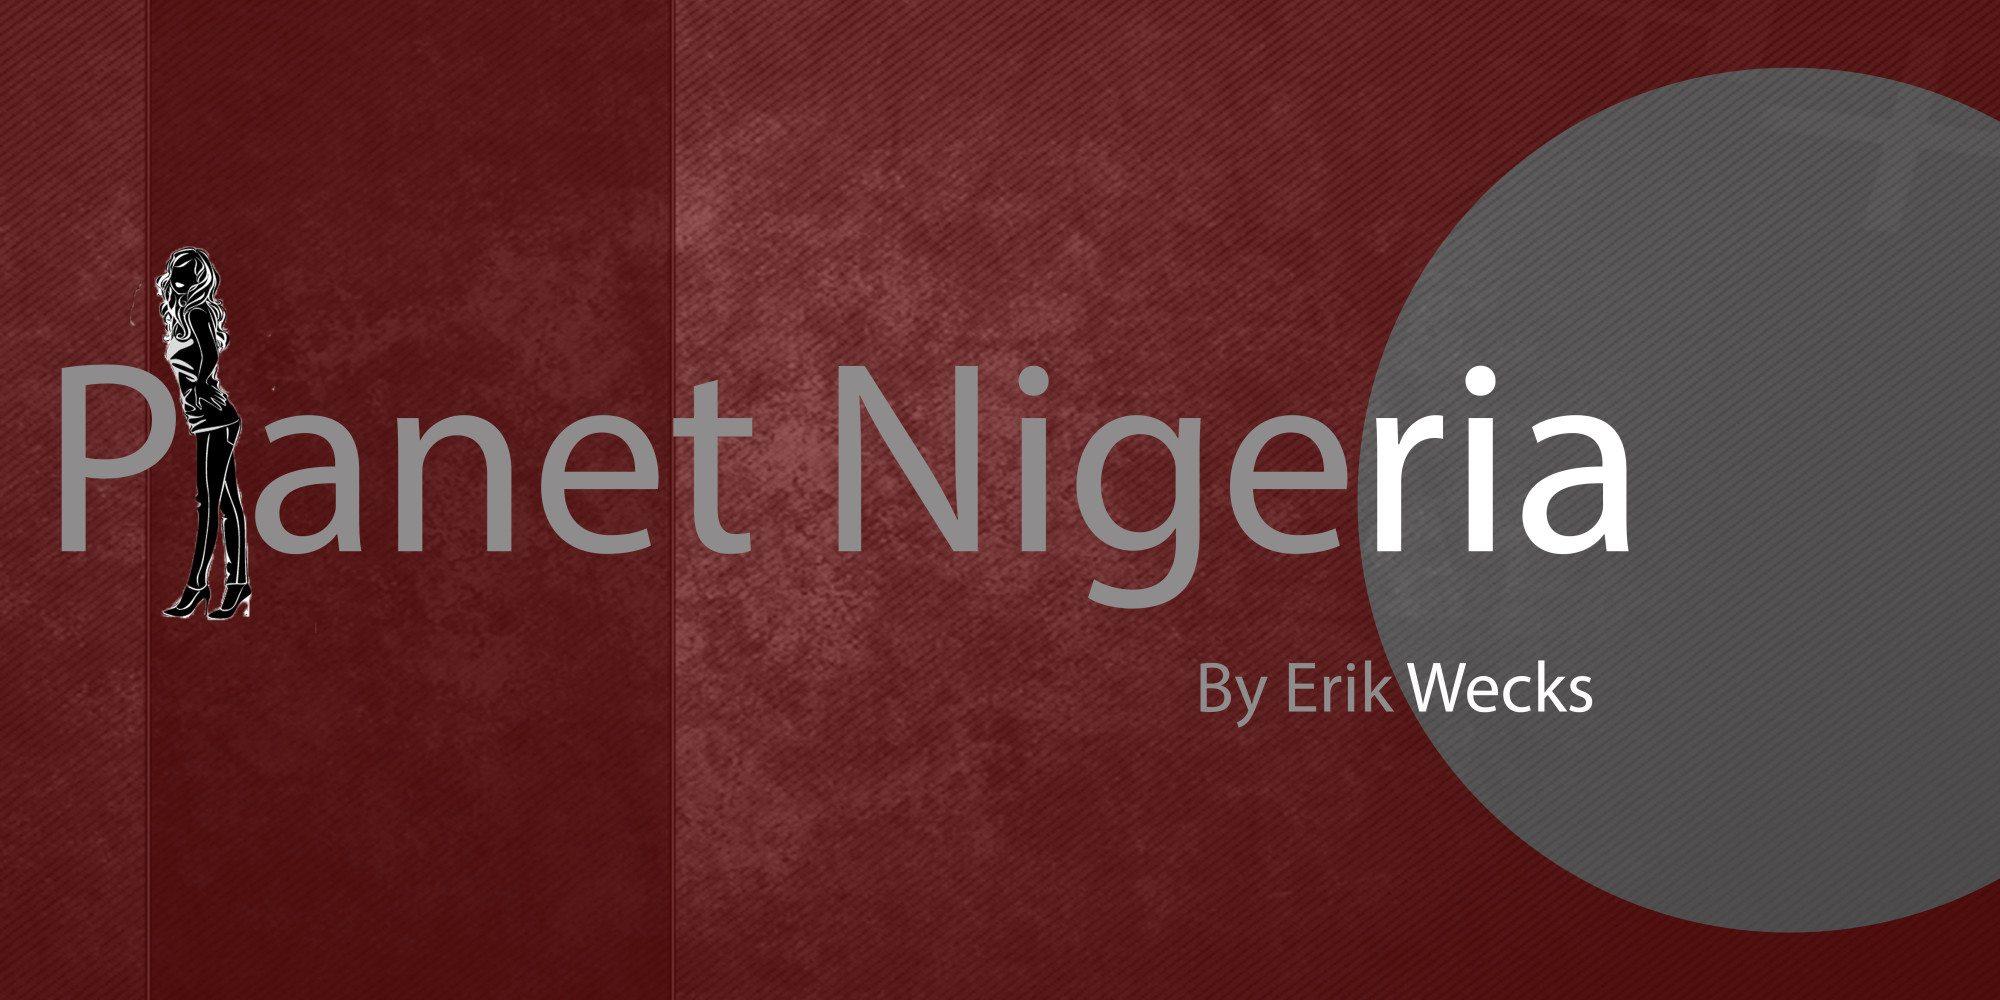 'Planet Nigeria,' a Short Story by Erik Wecks